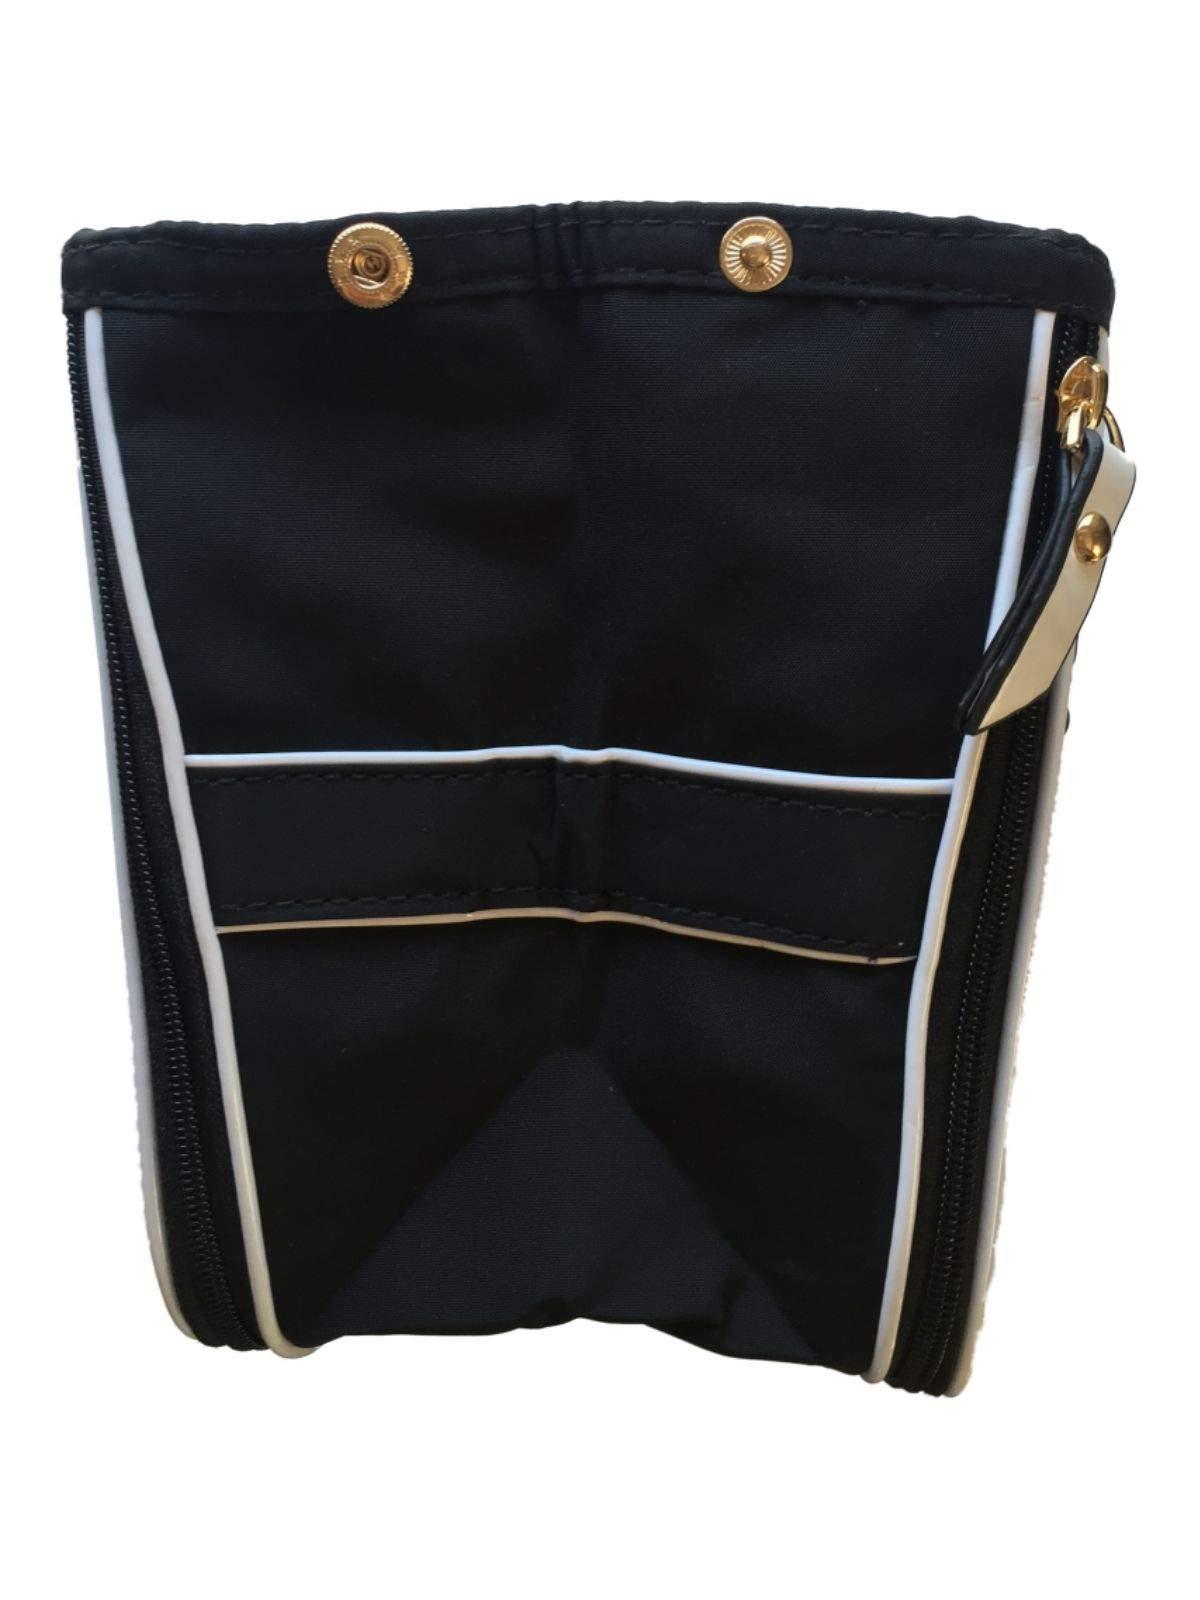 PurseN Handbag Organizer Insert (Small, Blanc Noir) by PurseN (Image #3)